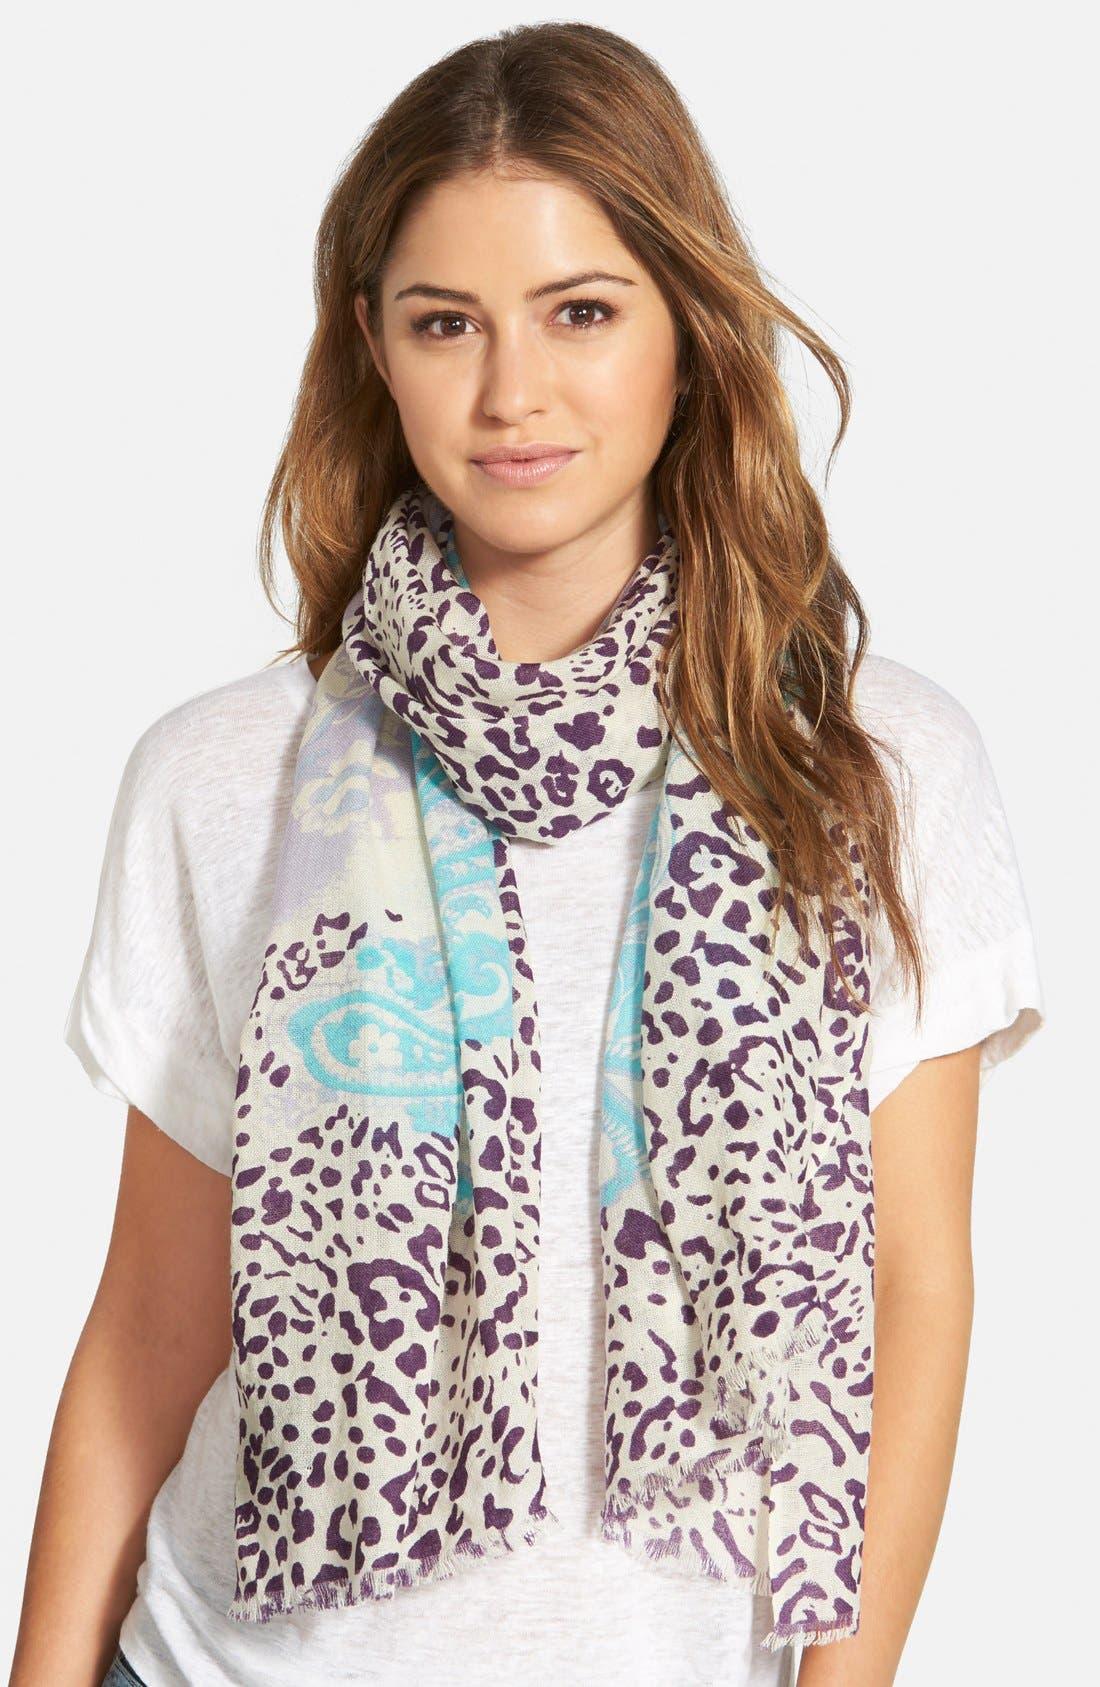 La Fiorentina Mixed Print Wool Scarf